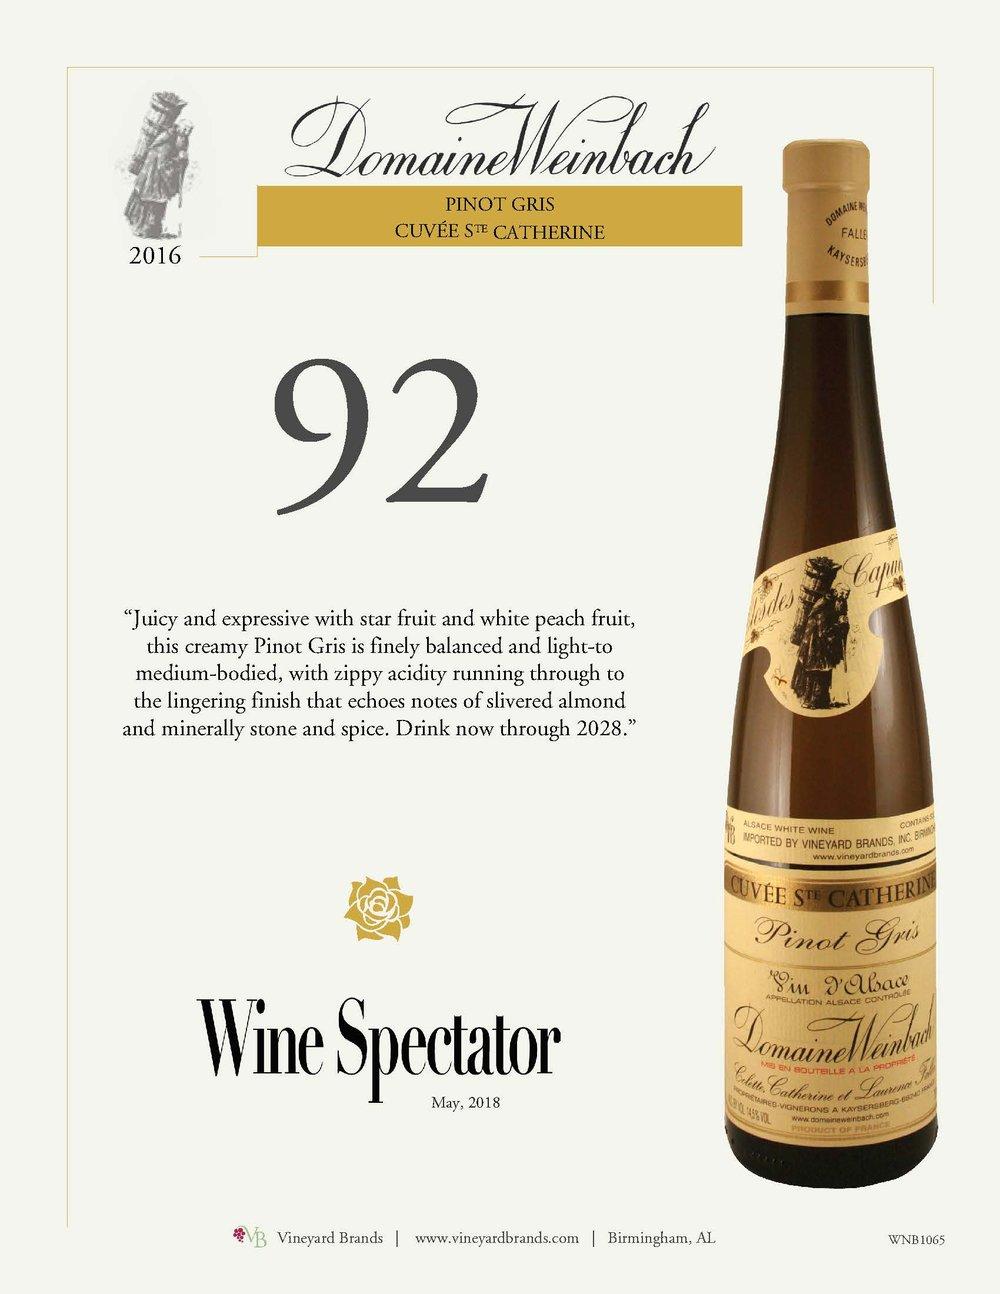 Weinbach Pinot Gris Cuvee Ste Catherine.jpg